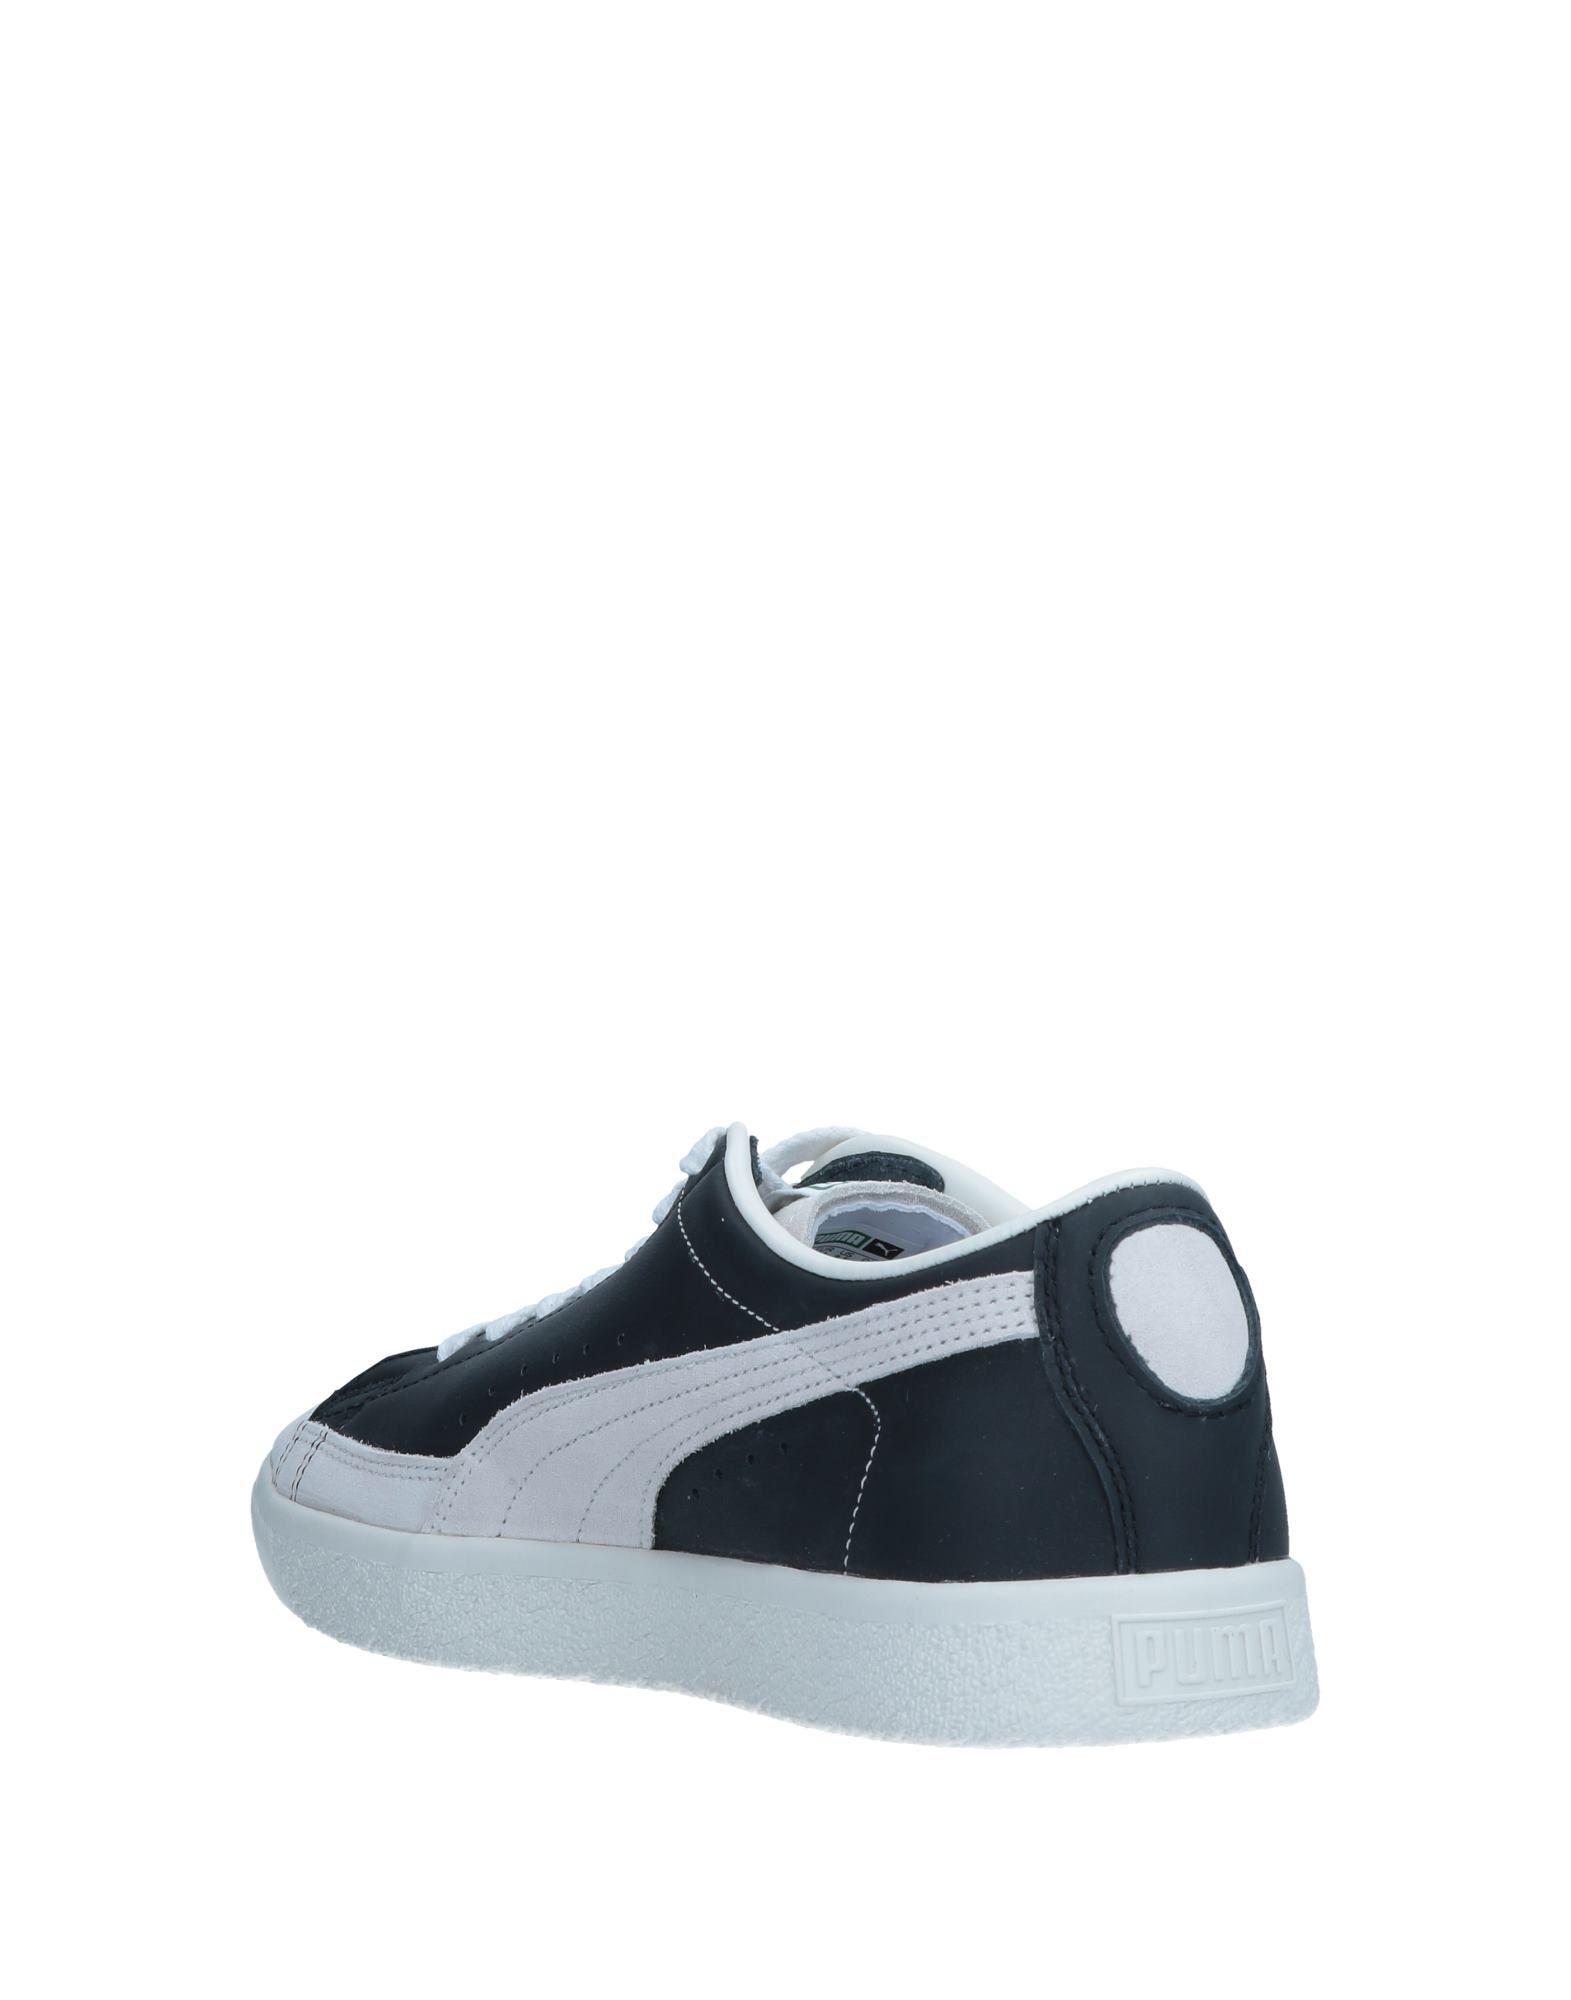 Rabatt echte Sneakers Schuhe Puma Sneakers echte Herren  11544319TB e73247